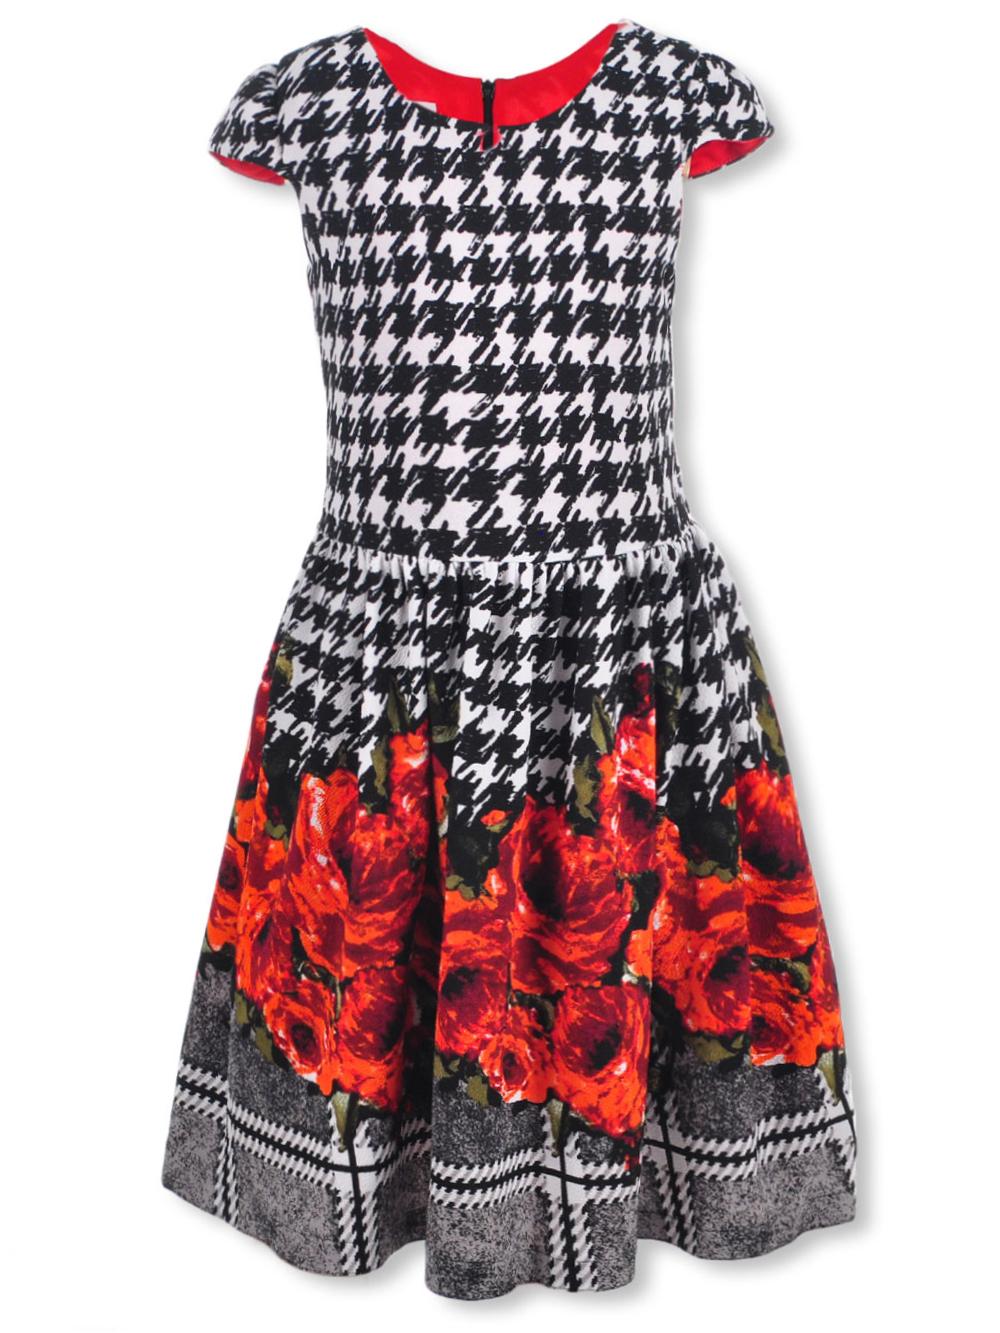 Plus Size Girls\' Dress by Bonnie Jean in Black/white